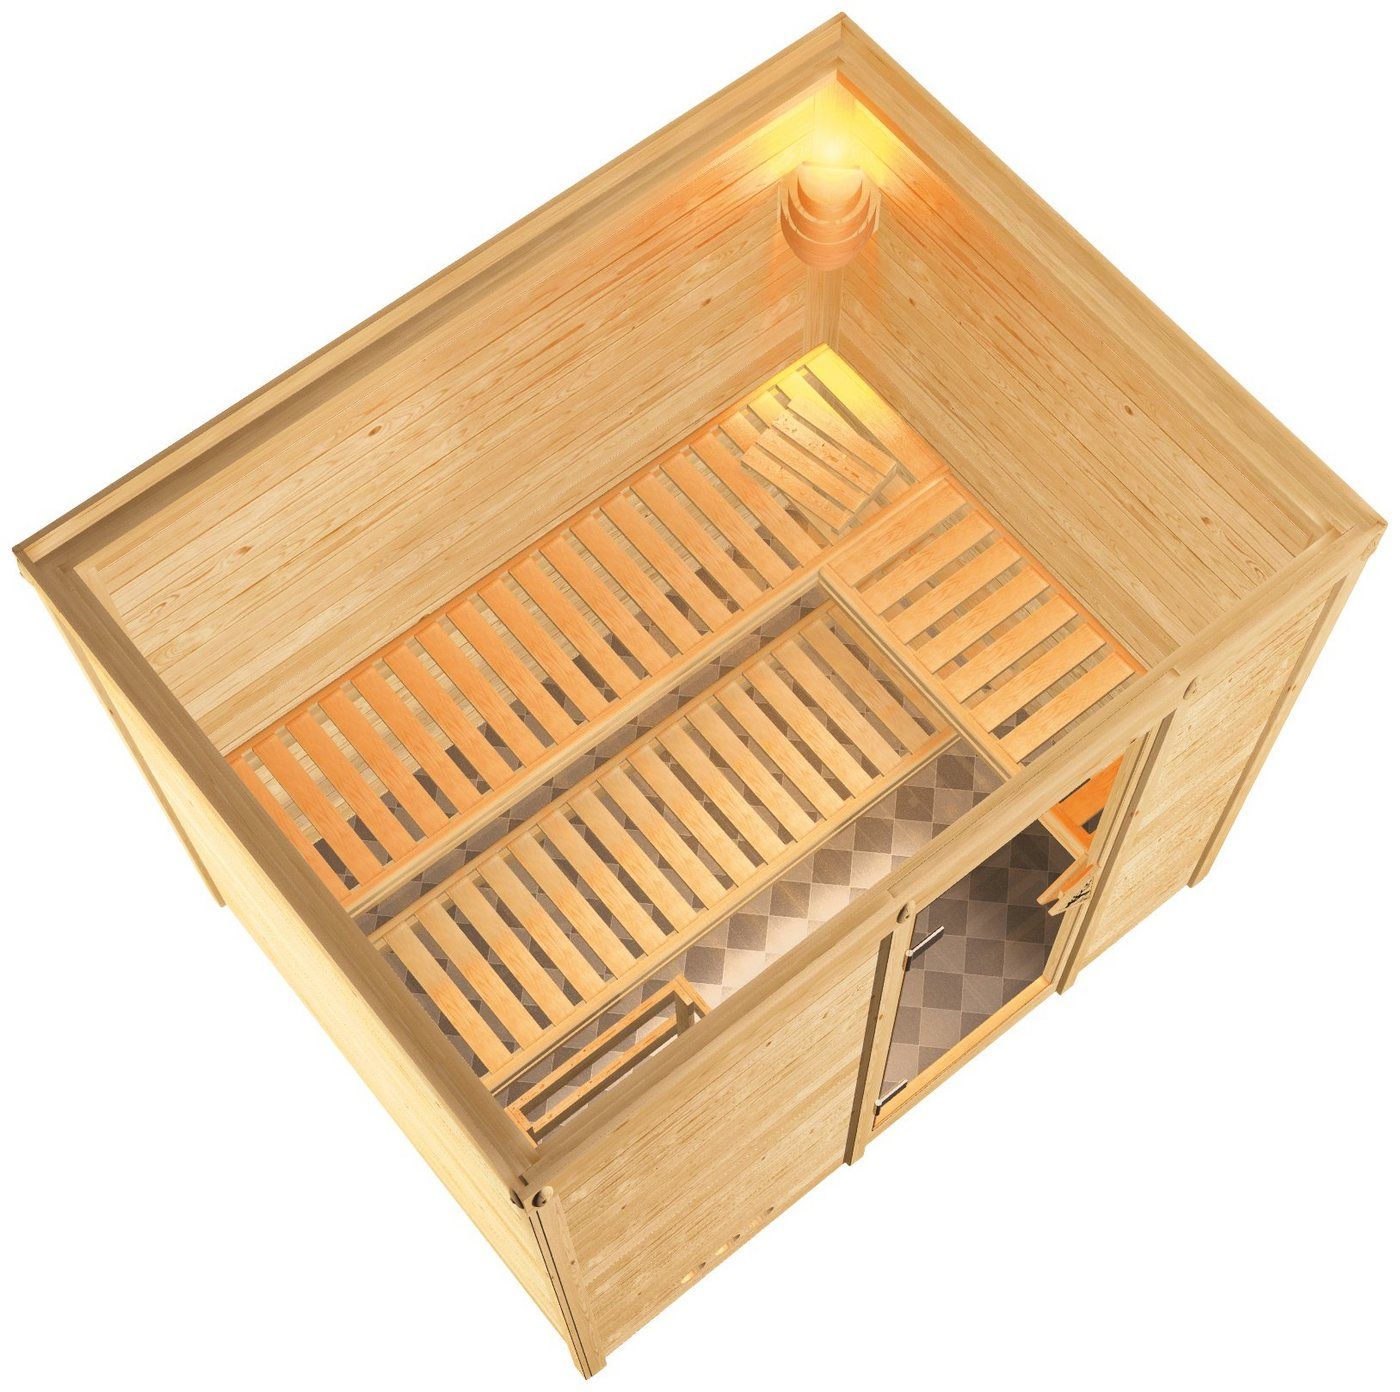 KARIBU Sauna »Sonara«, 236/184/209 cm, ohne Ofen, Glastür satiniert